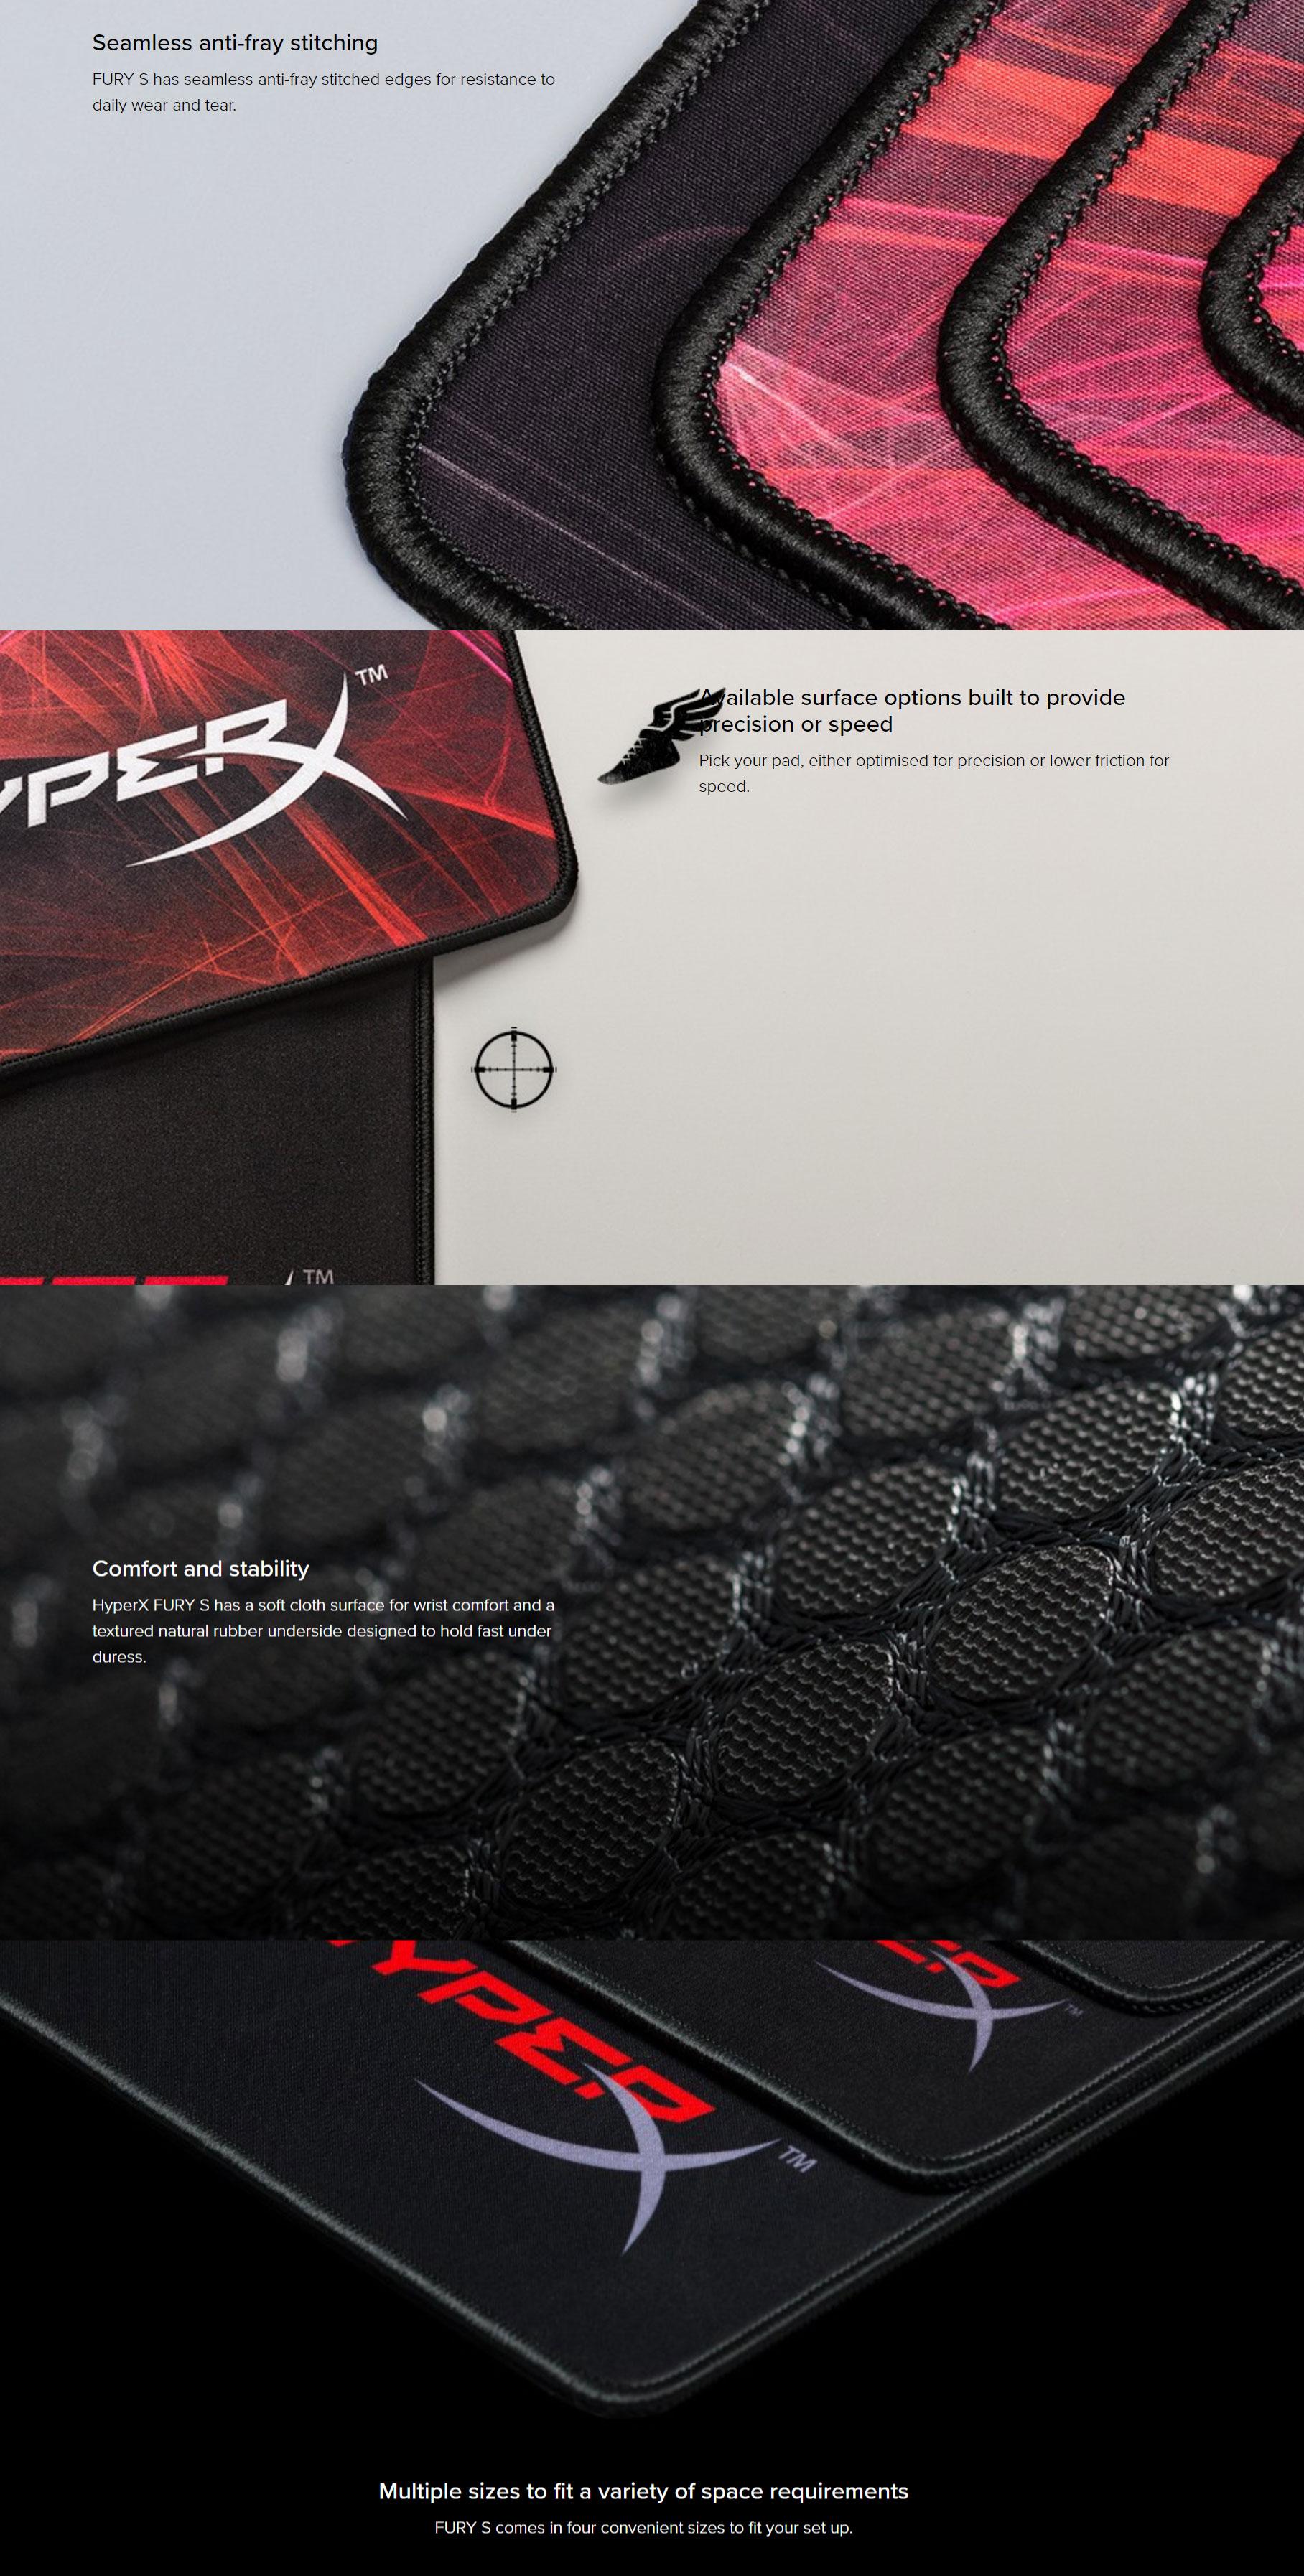 FireShot-Capture-004---FURY-Pro-Gaming-Mouse-Mat---HyperX---www.jpg